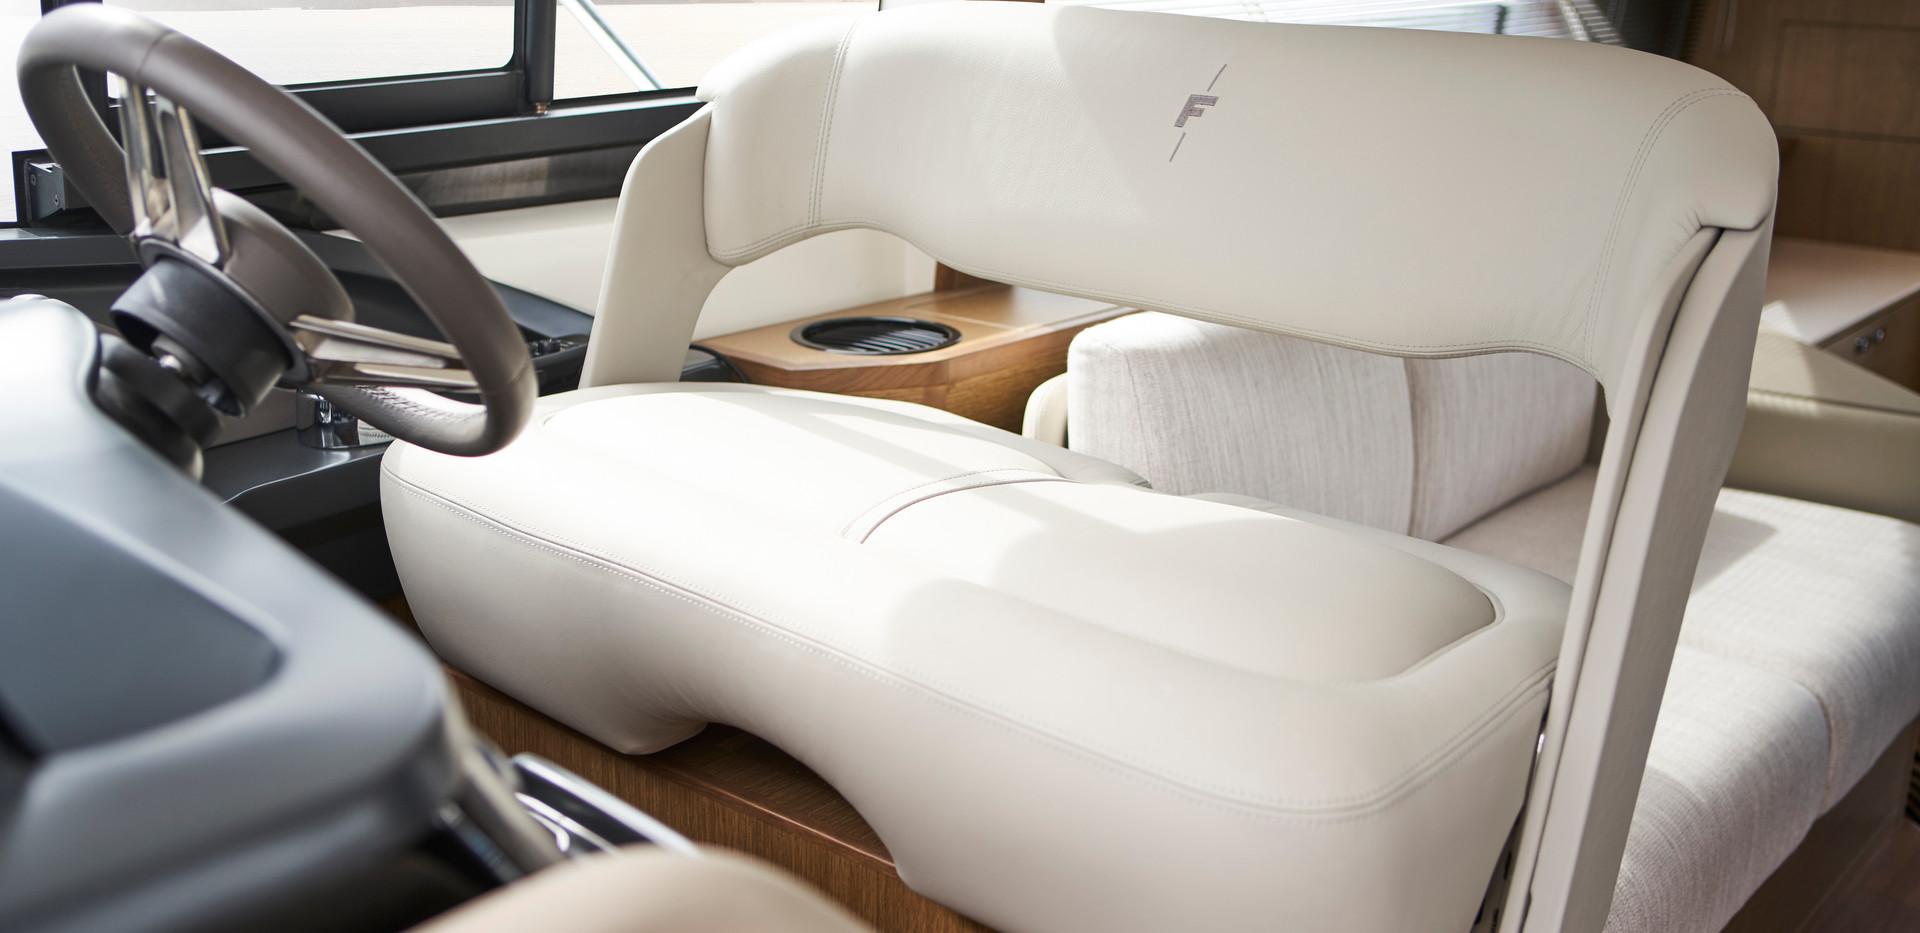 f45-interior-helm-seat-rovere-oak-satin.